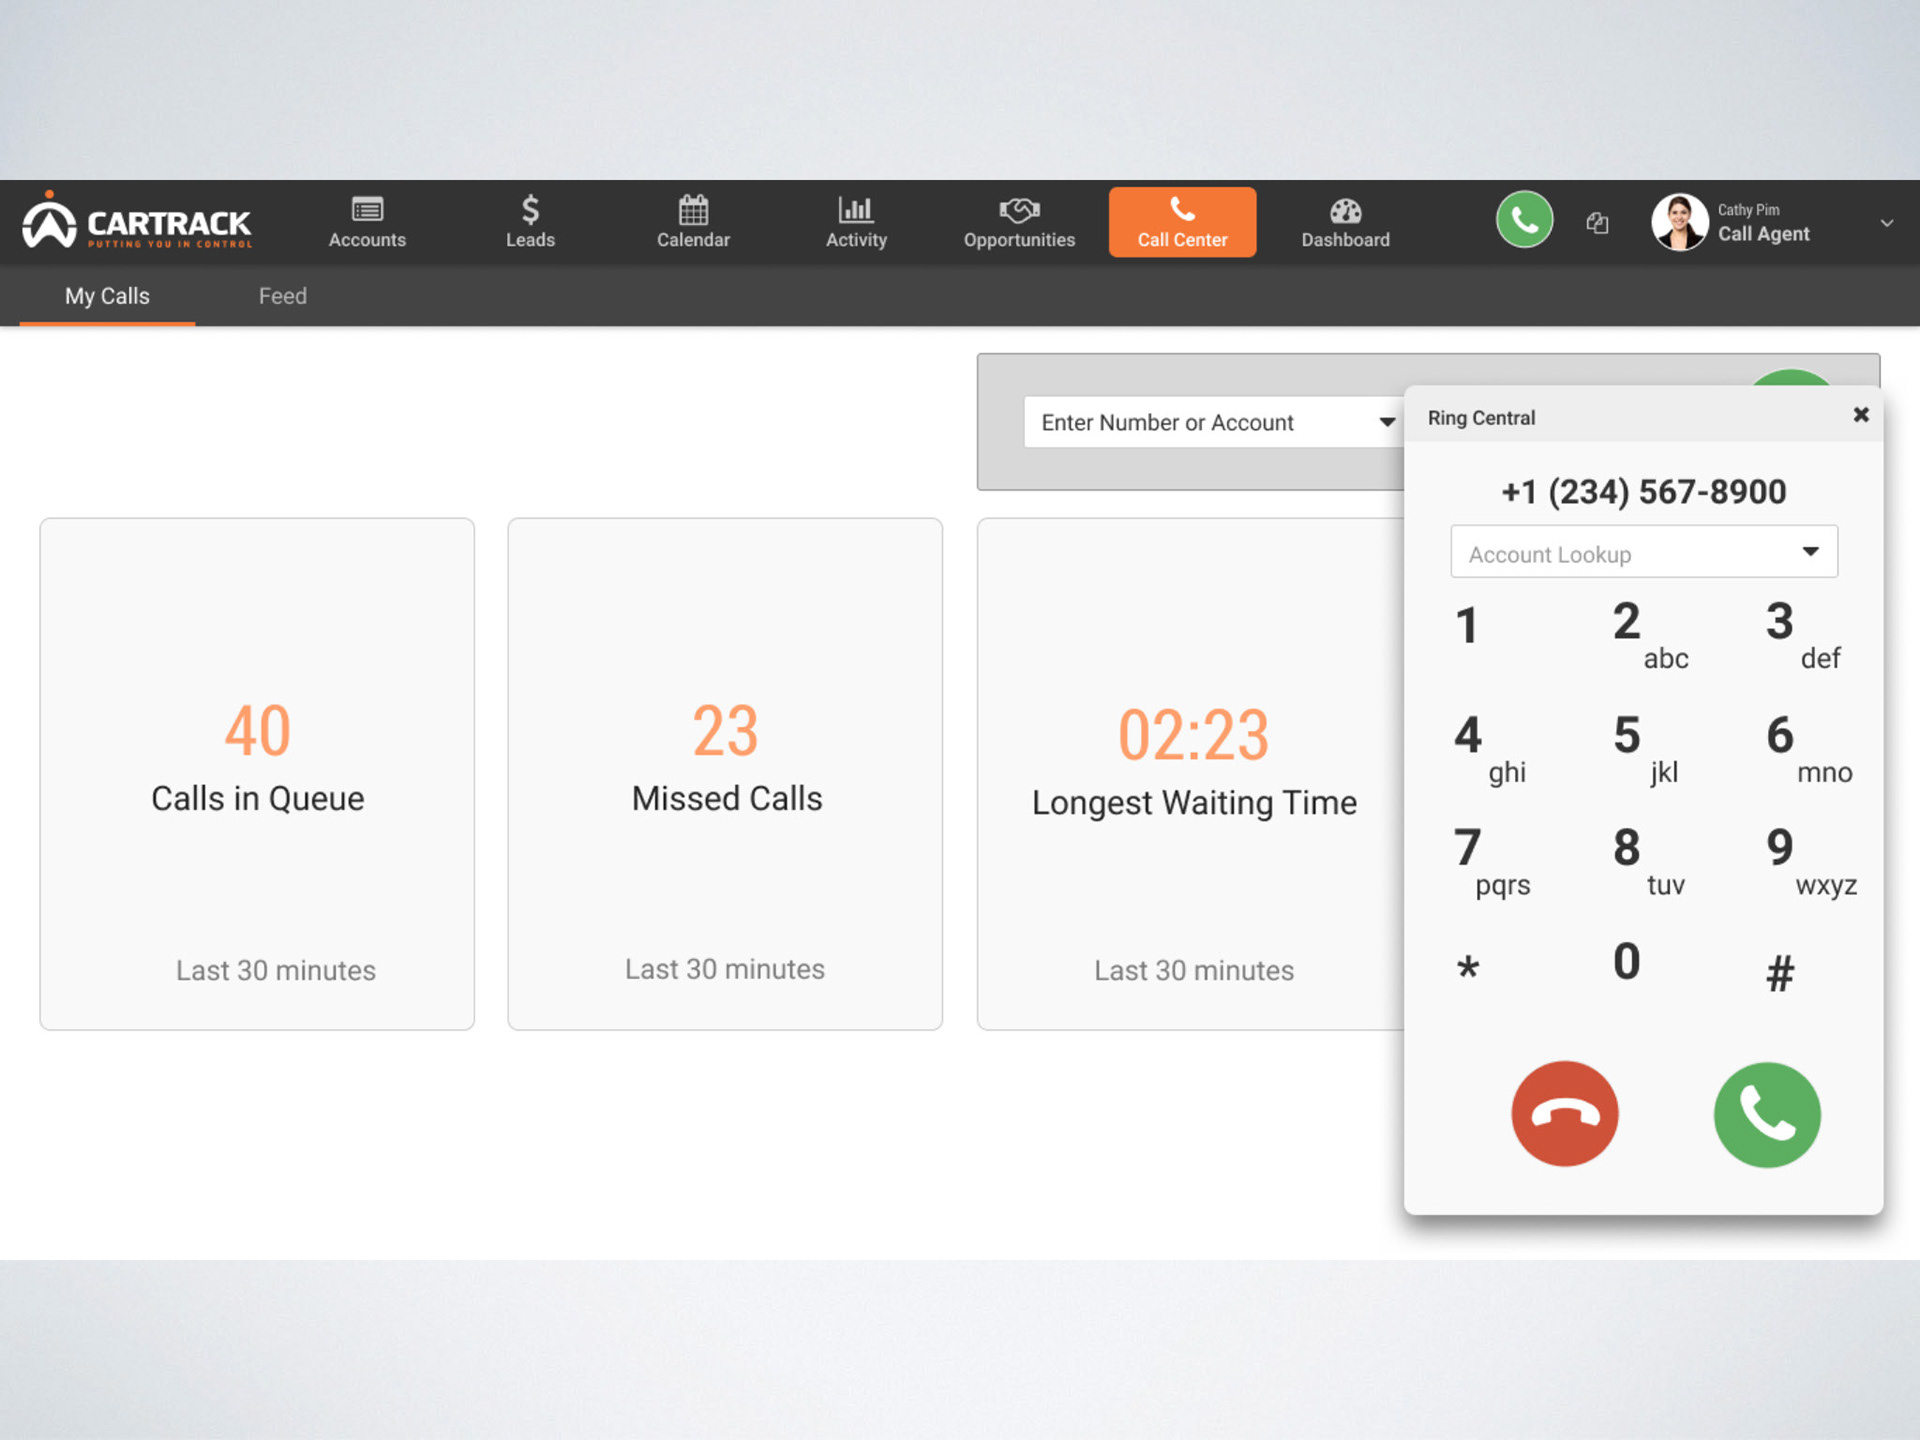 Desktop call center dashboard, keeping track of calls.